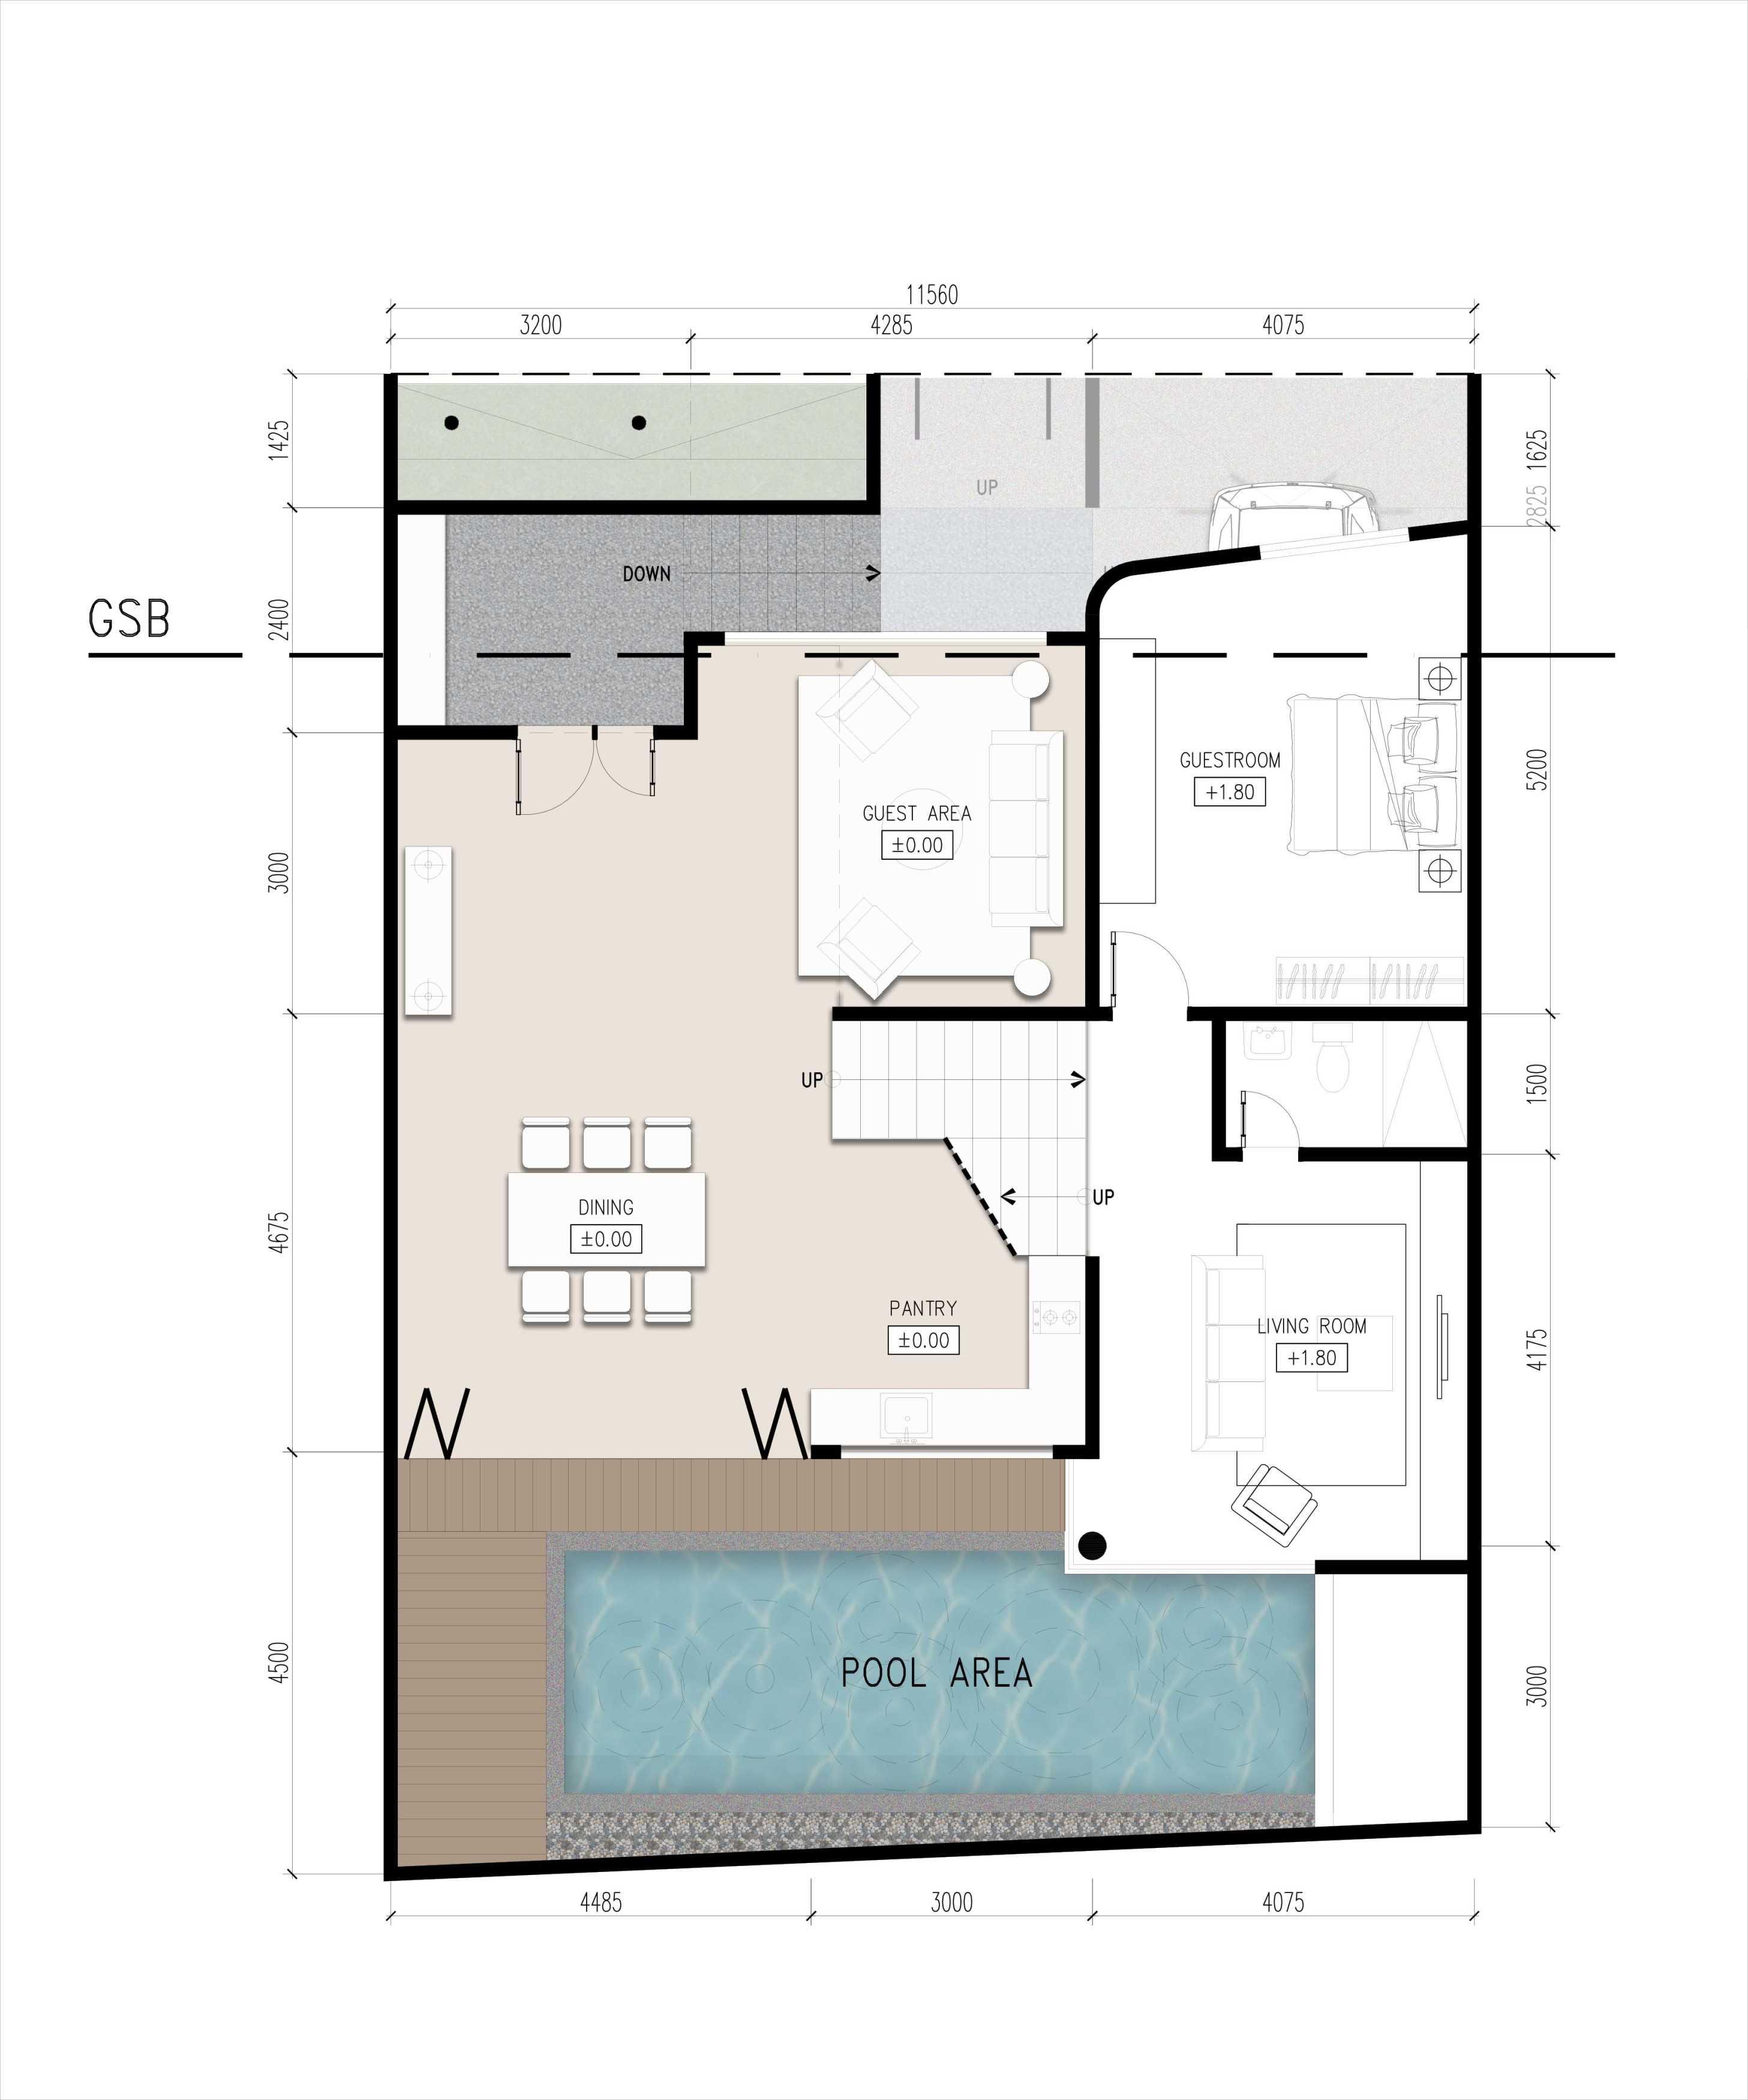 Zigzag Architecture Studio F House Cipinang, Pulo Gadung, Kota Jakarta Timur, Daerah Khusus Ibukota Jakarta, Indonesia Cipinang, Pulo Gadung, Kota Jakarta Timur, Daerah Khusus Ibukota Jakarta, Indonesia Zigzag-Architecture-Studio-F-House   56836